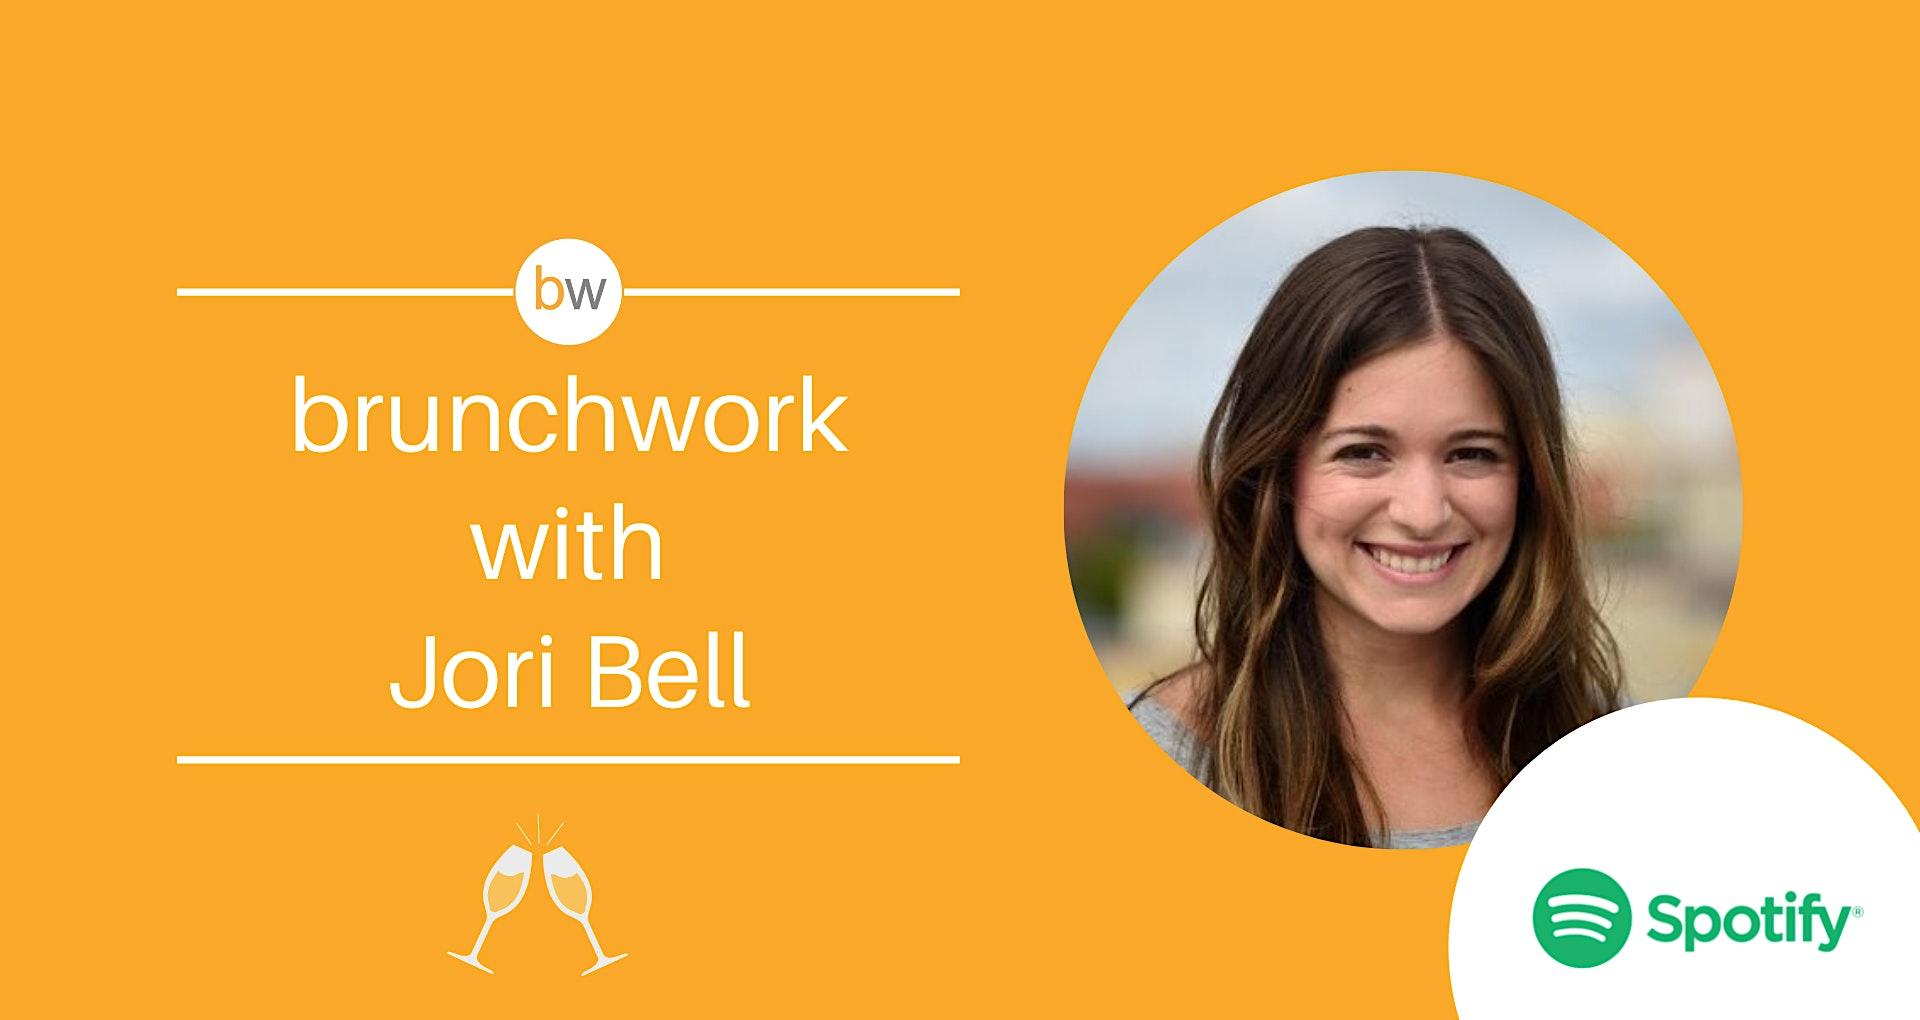 brunchwork w/ Jori Bell (Spotify)